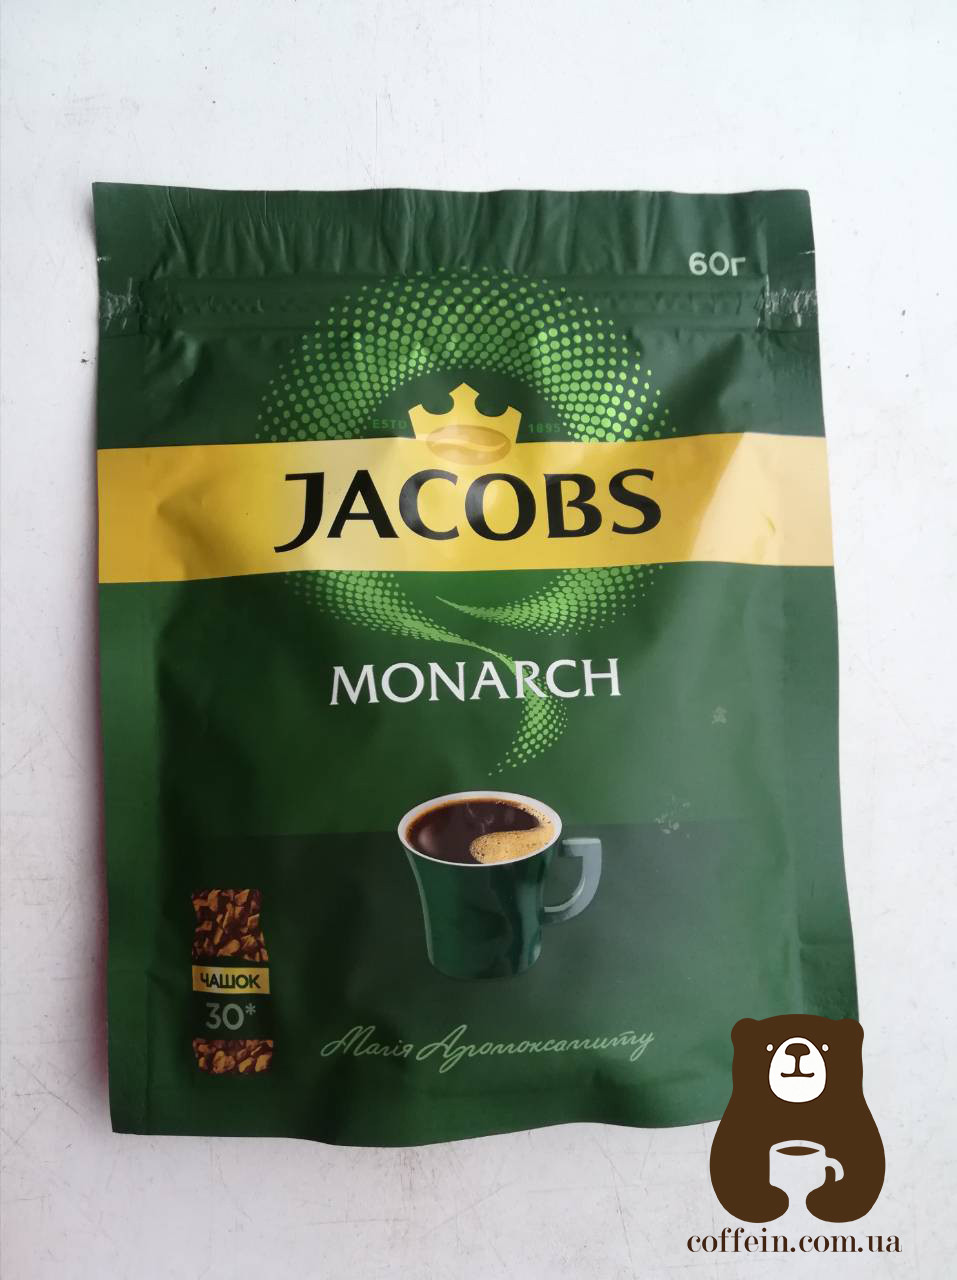 Кофе Jacobs Monarch 60 грамм (Германия)